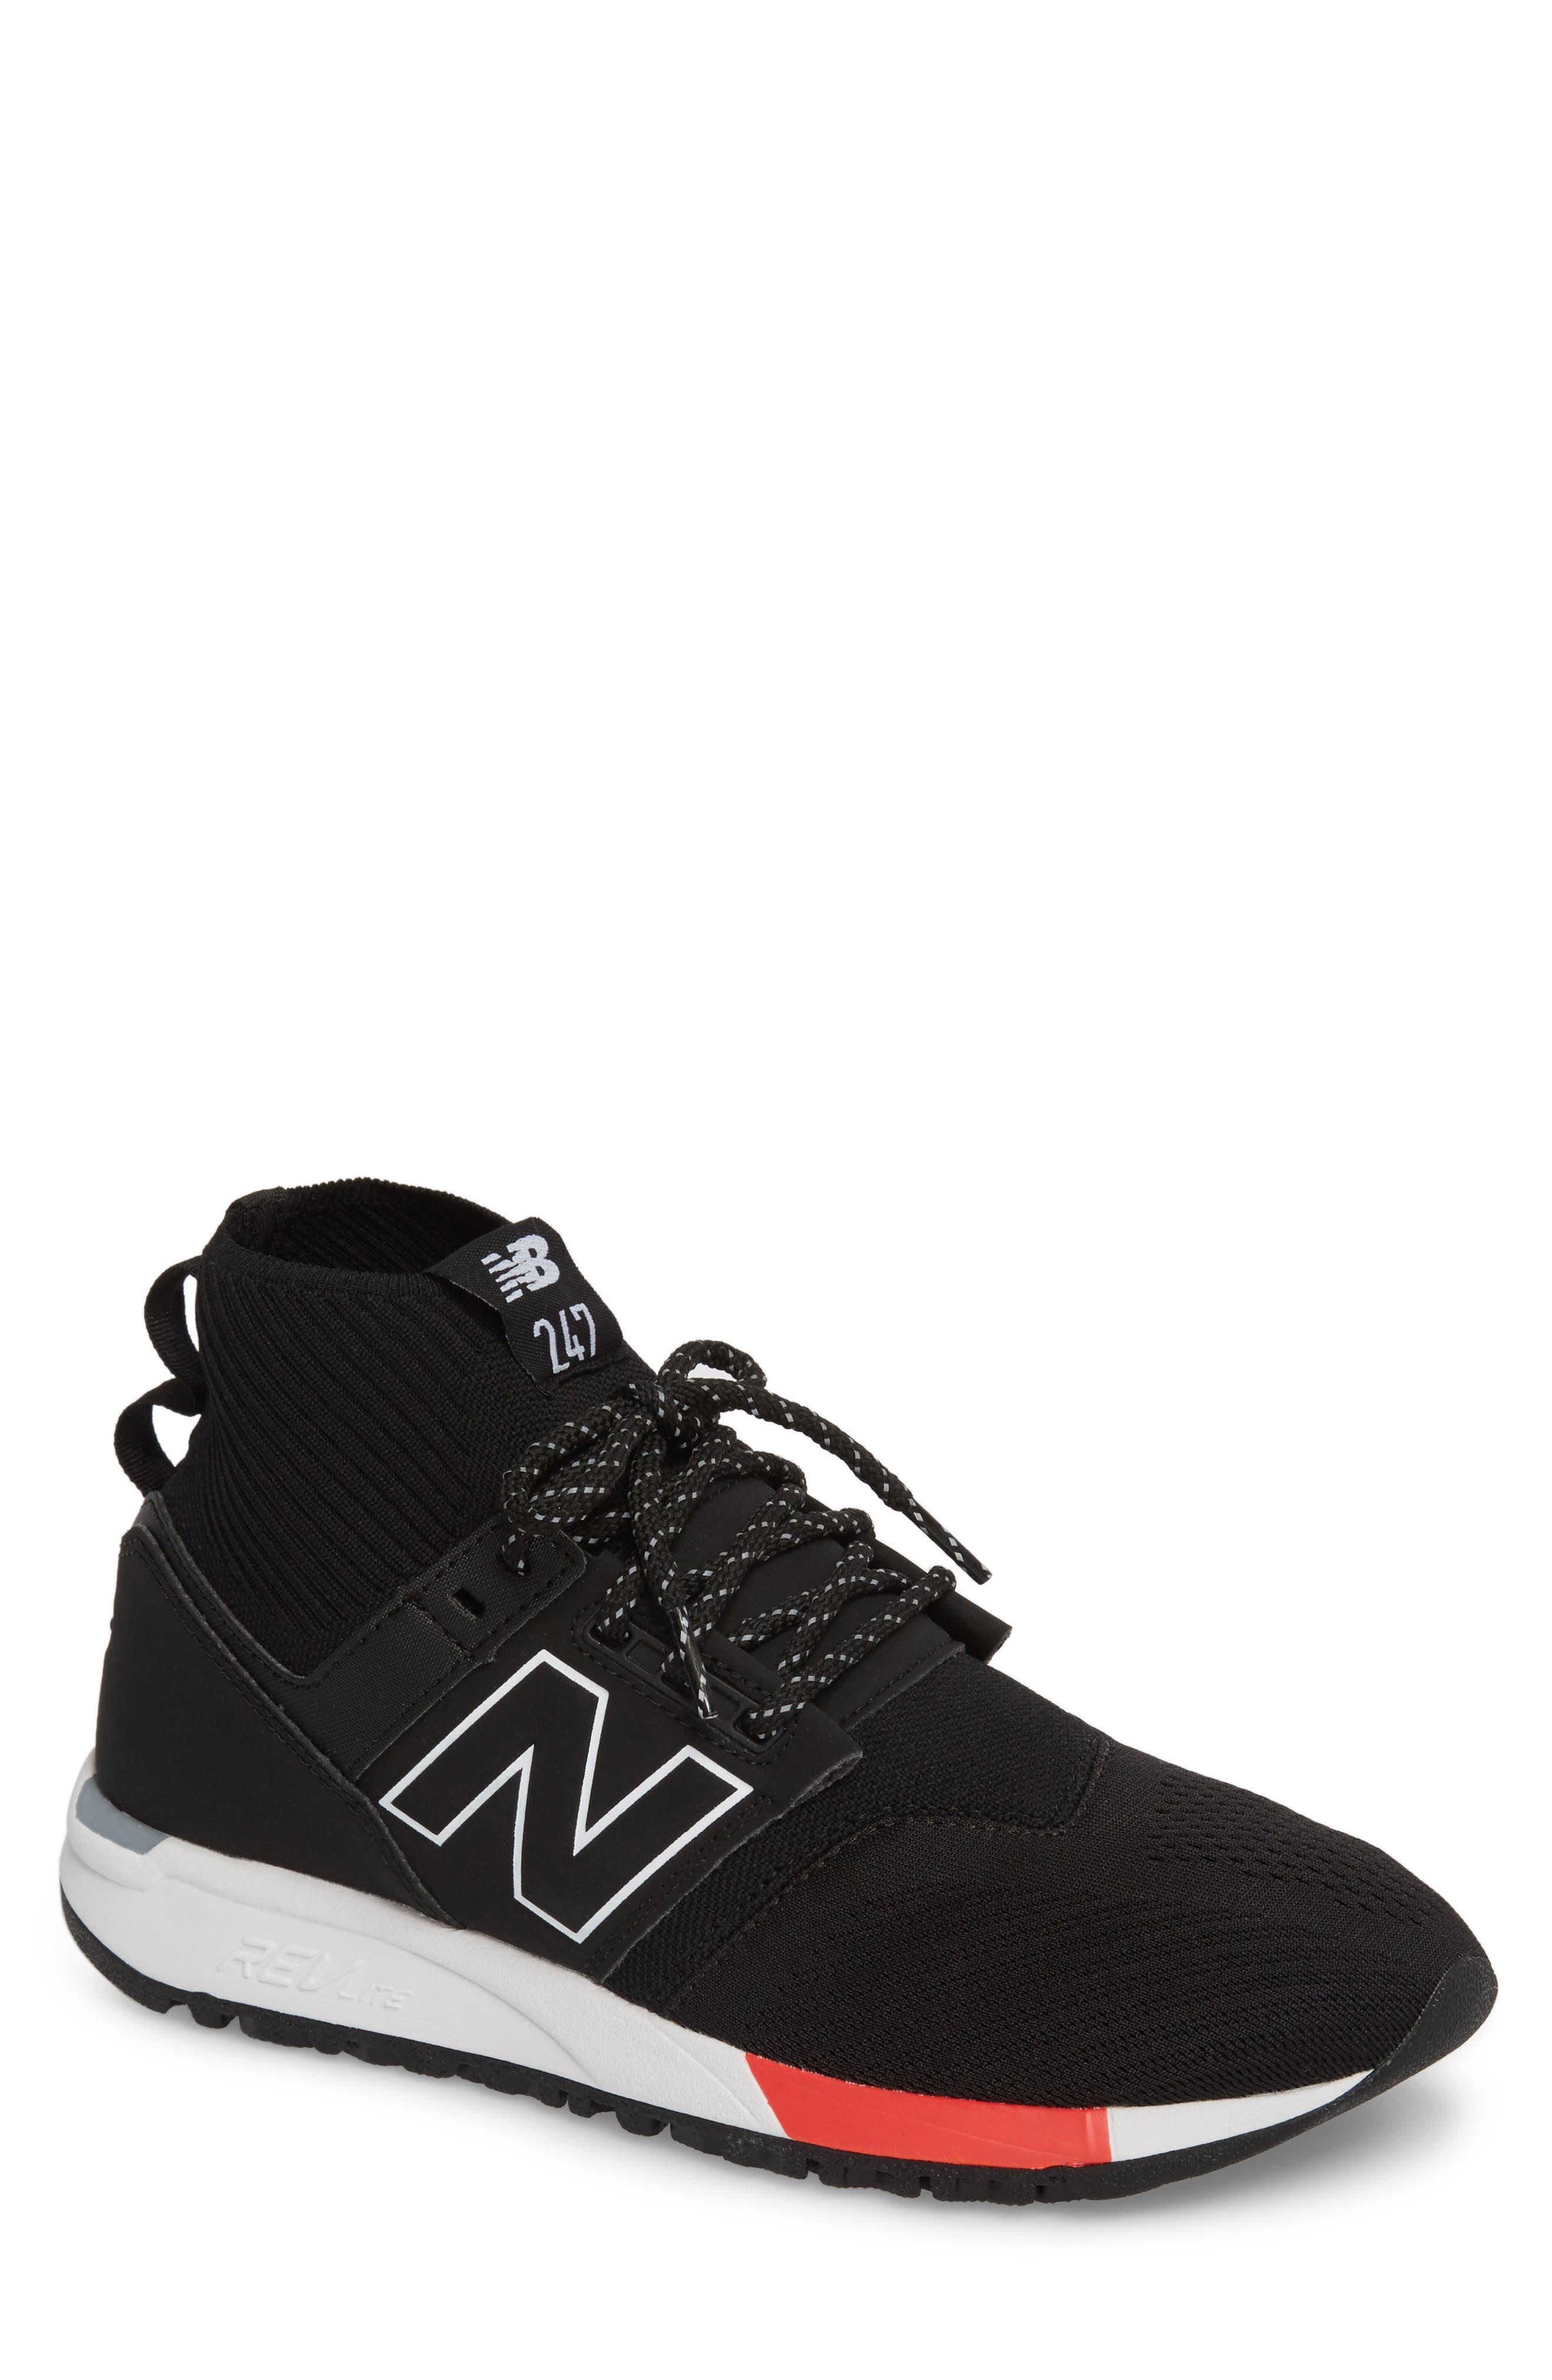 247 Mid Sneaker,                         Main,                         color, Black